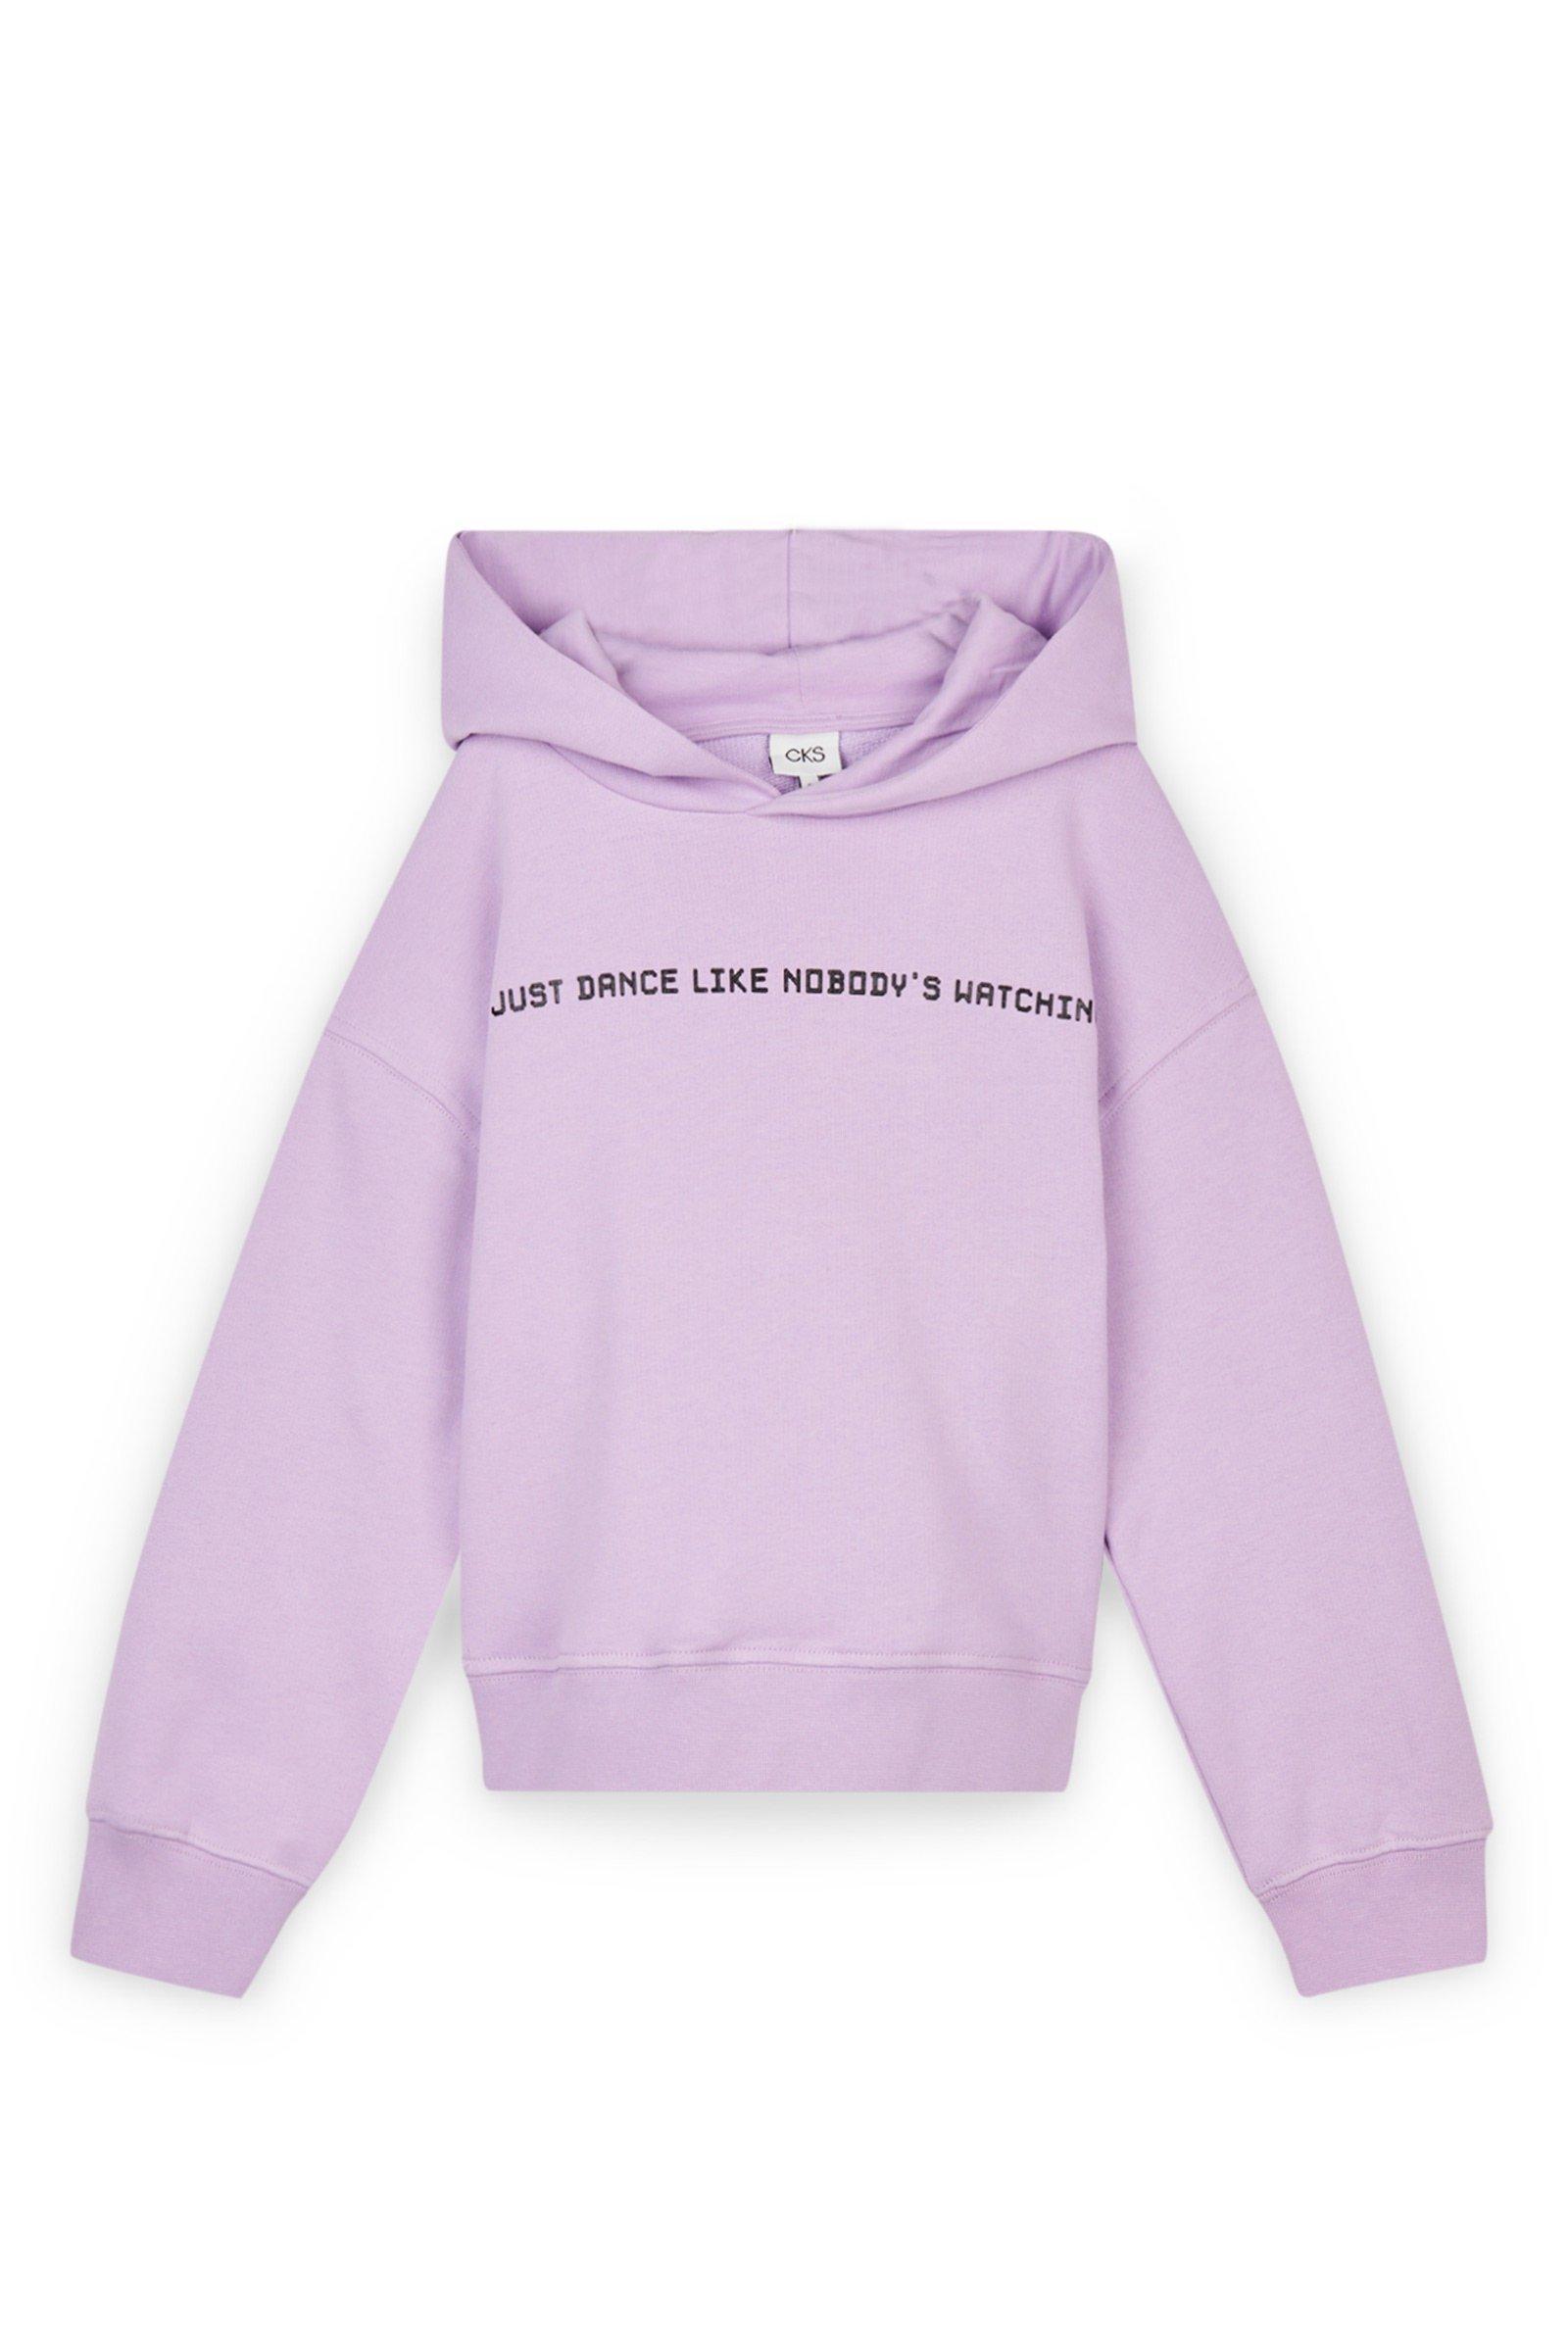 https://webmedia.cks-fashion.com/i/cks/123195ASM_50_l